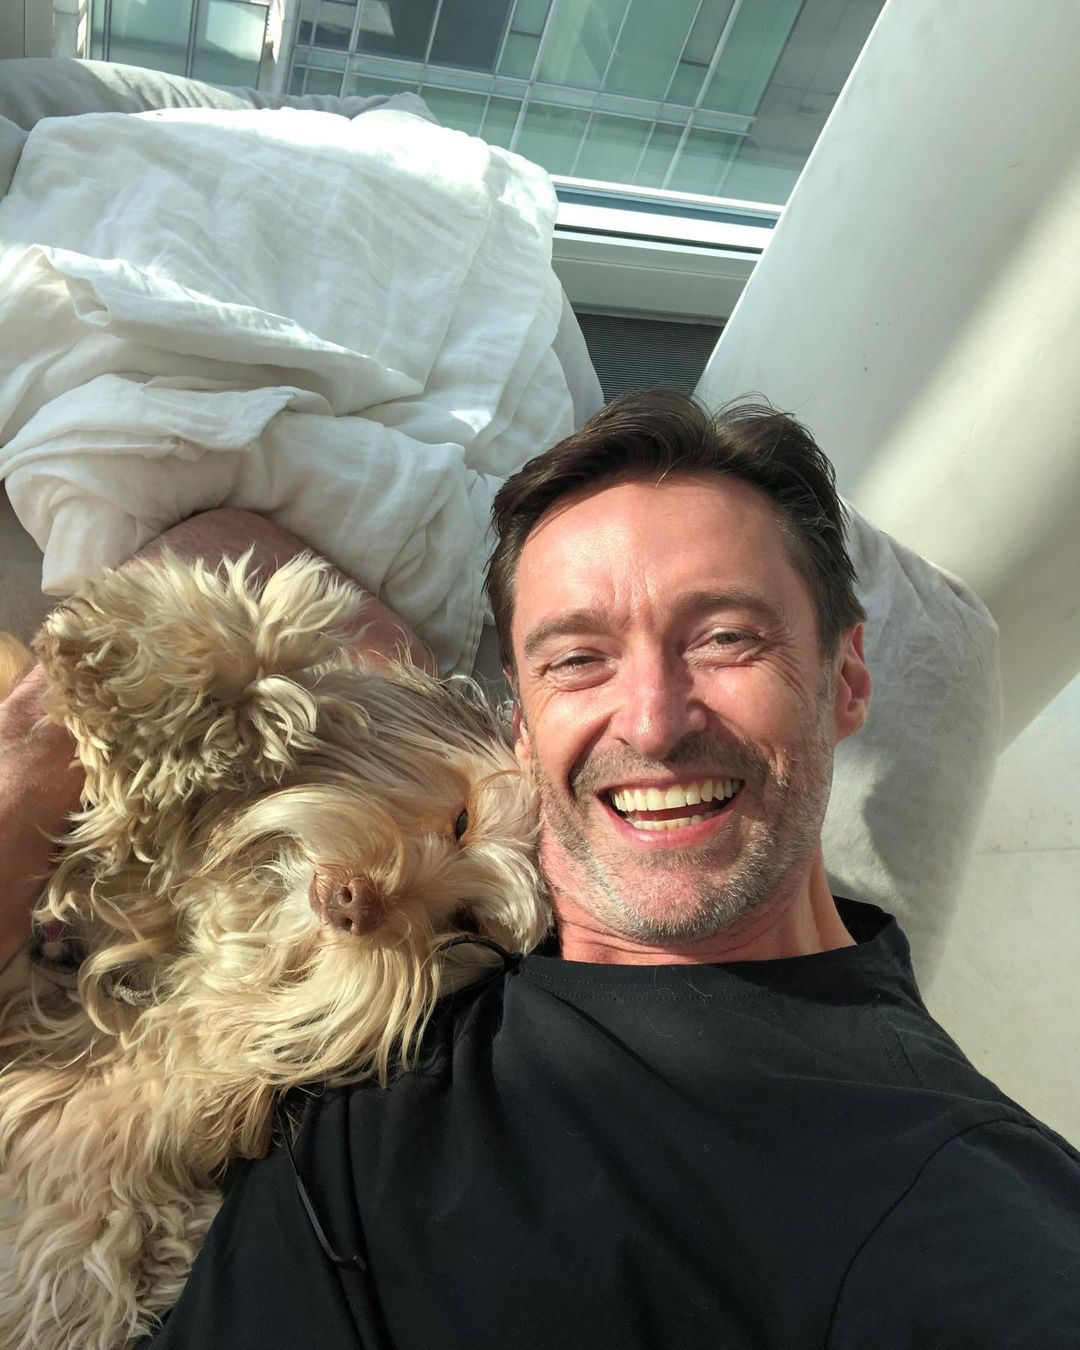 where-does-hugh-jackman-live-photos-inside-his-nyc-penthouse